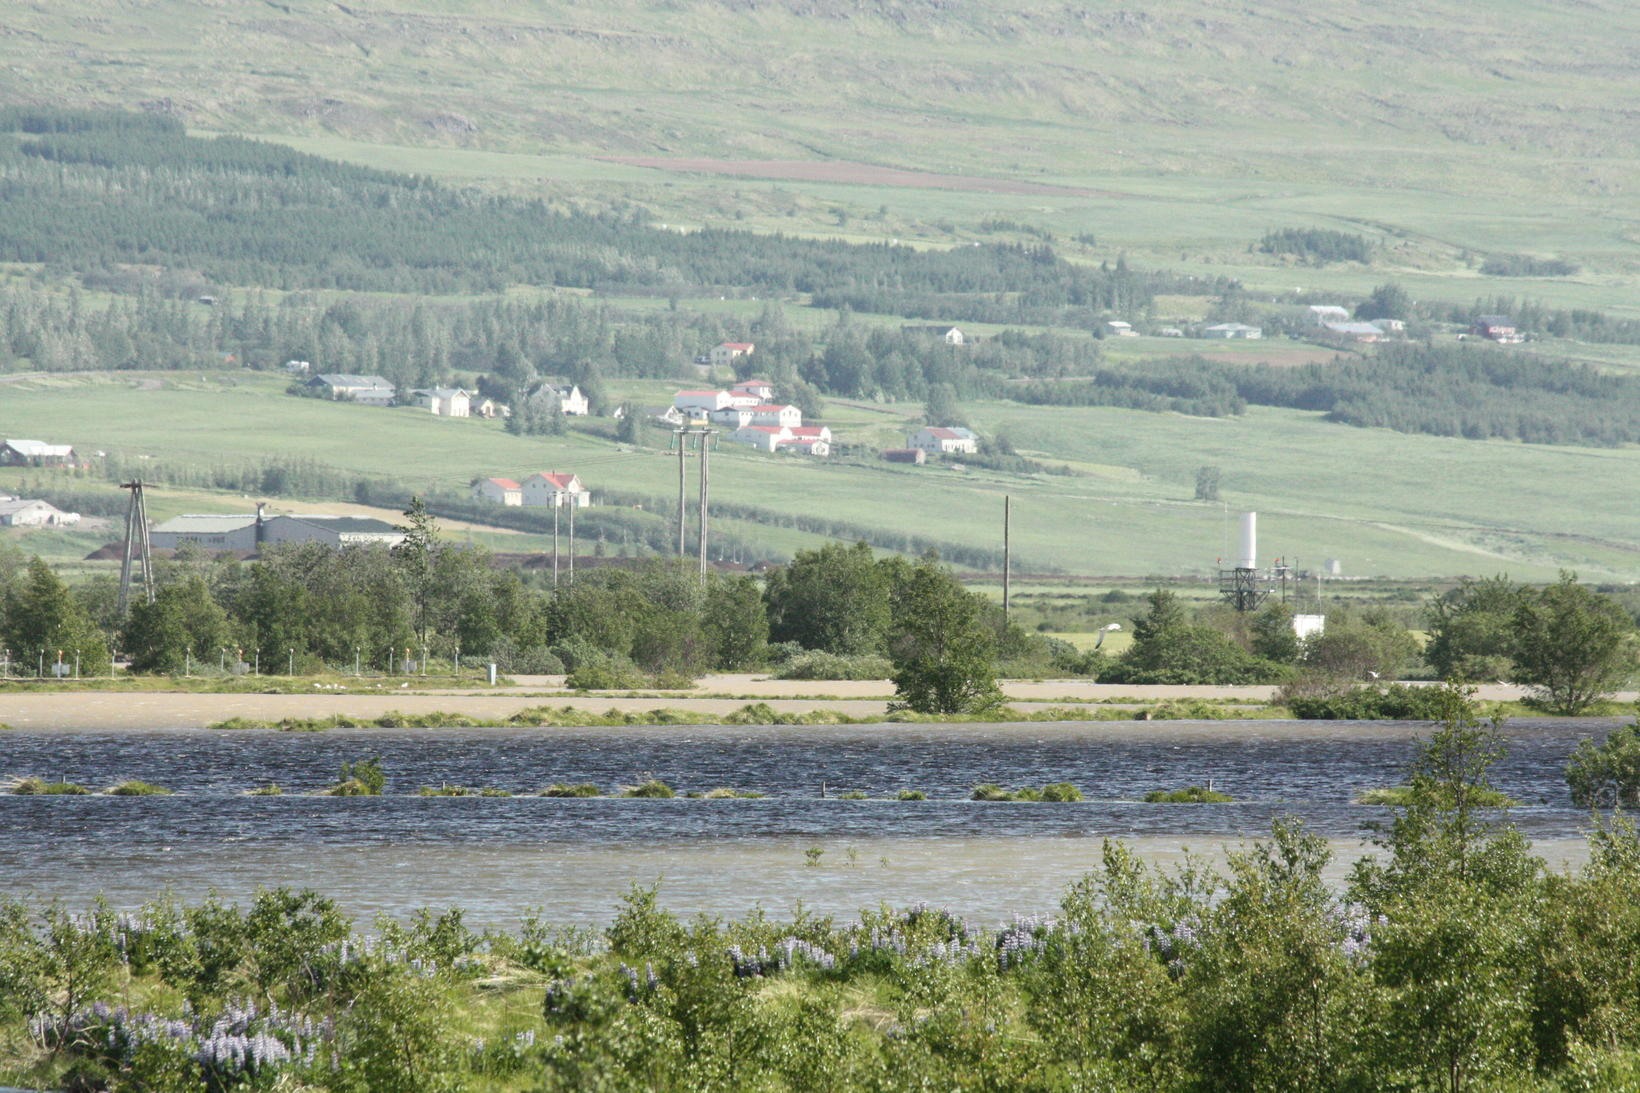 Eyjafjarðará river is swollen.